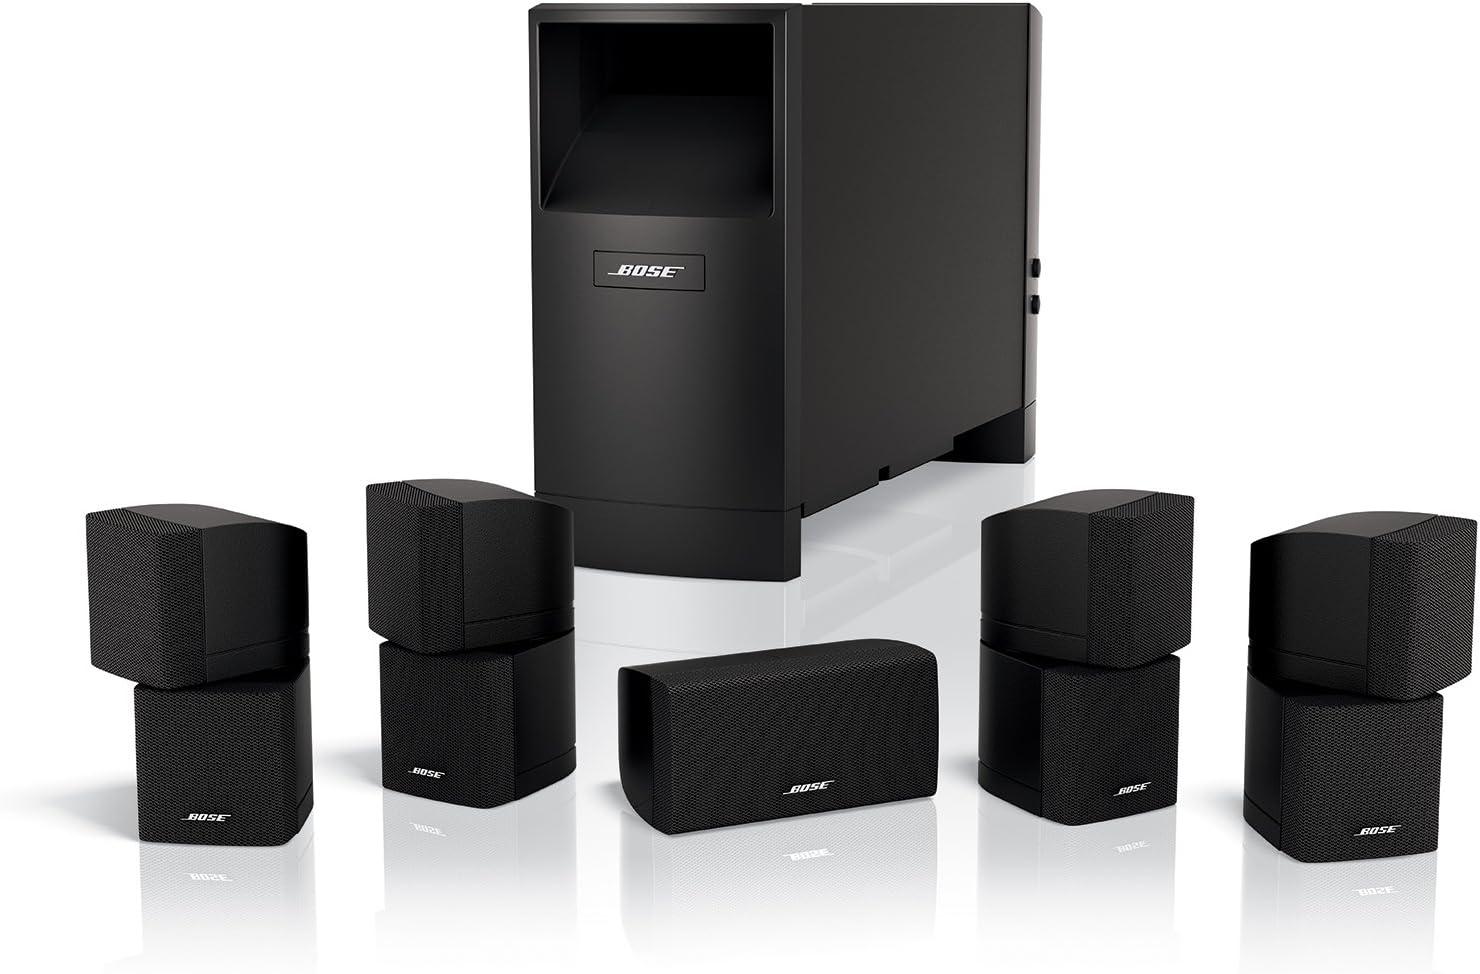 Amazon.com: Bose Acoustimass 10 Series IV Home Entertainment Speaker System  (Black): Home Audio & TheaterAmazon.com